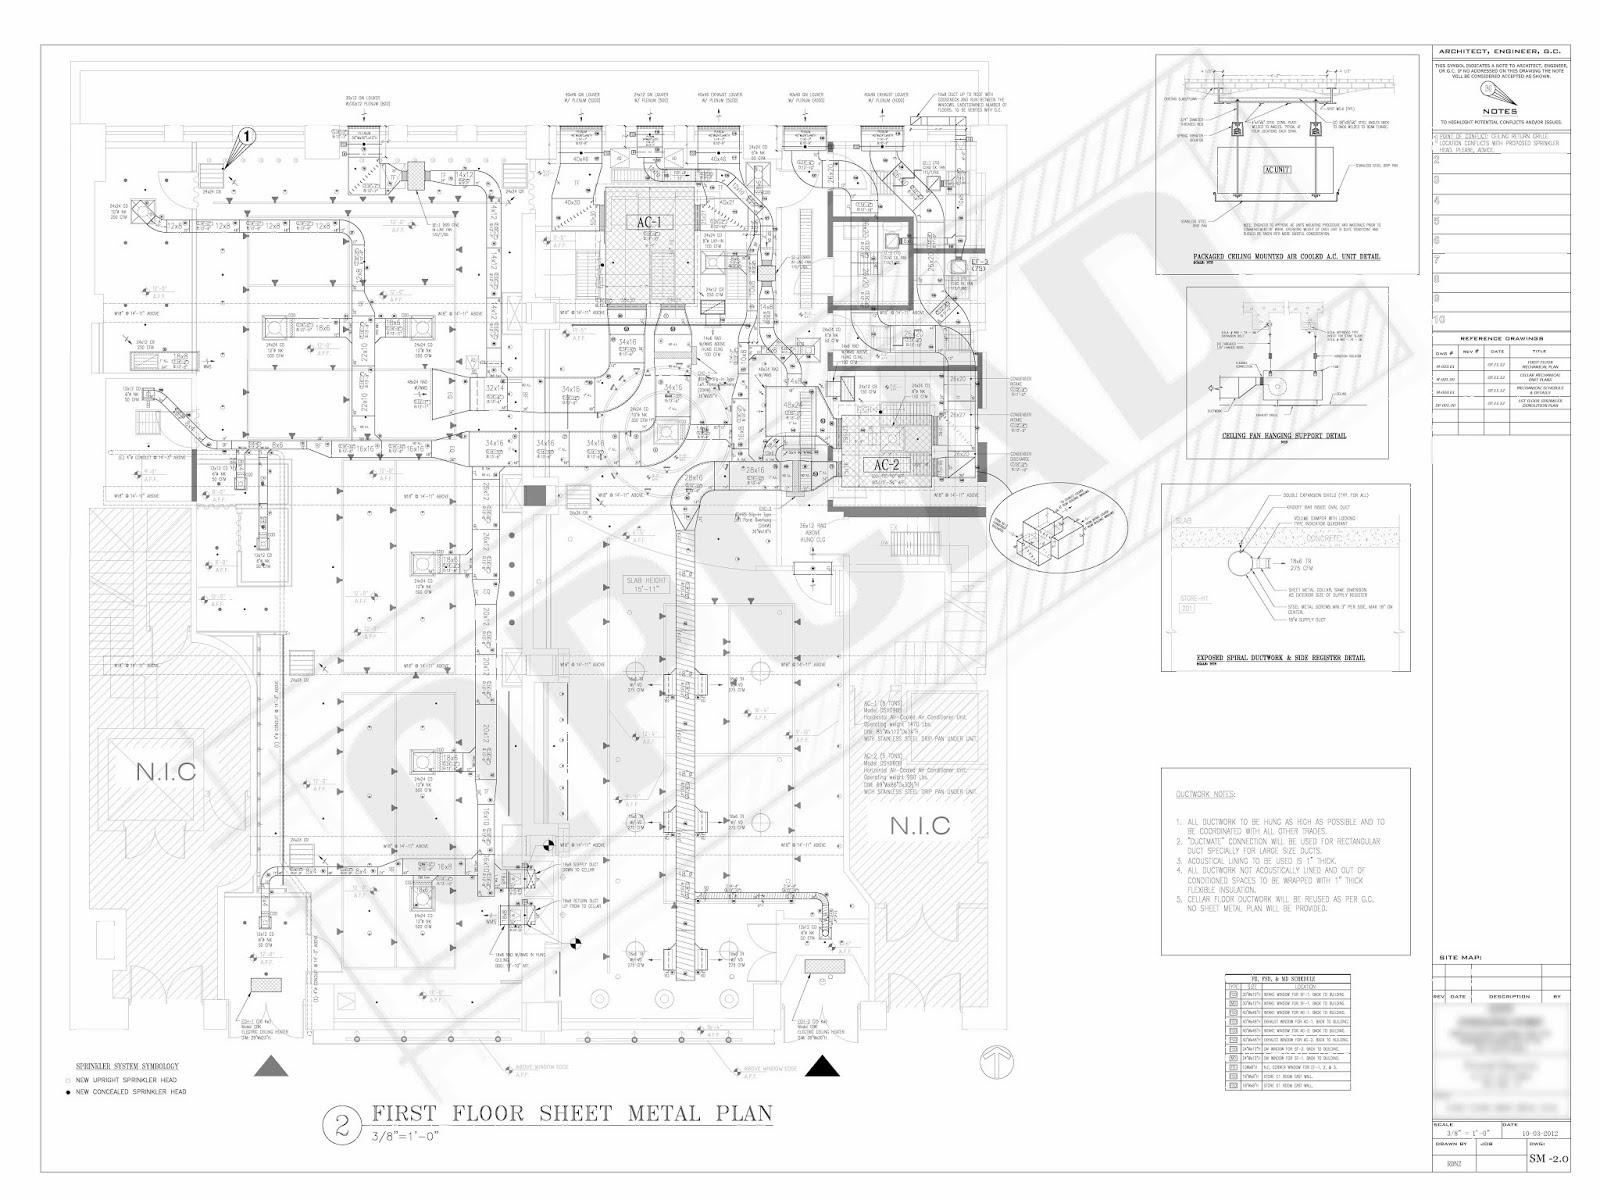 commercial hvac shop drawing medium scale project [ 1600 x 1200 Pixel ]